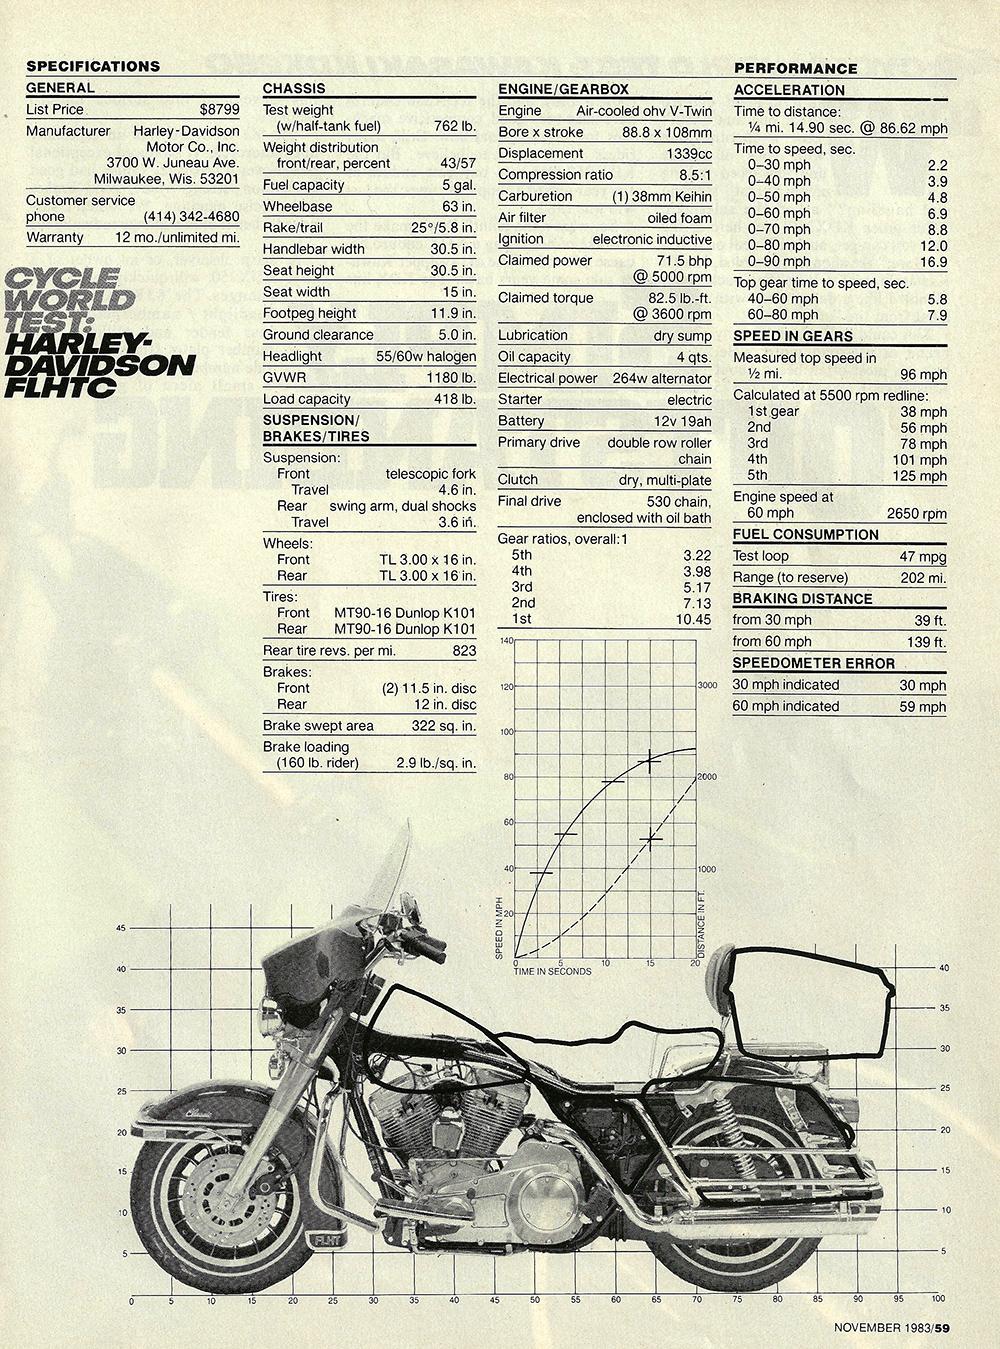 1983 Harley-Davidson FLHTC road test 06.jpg